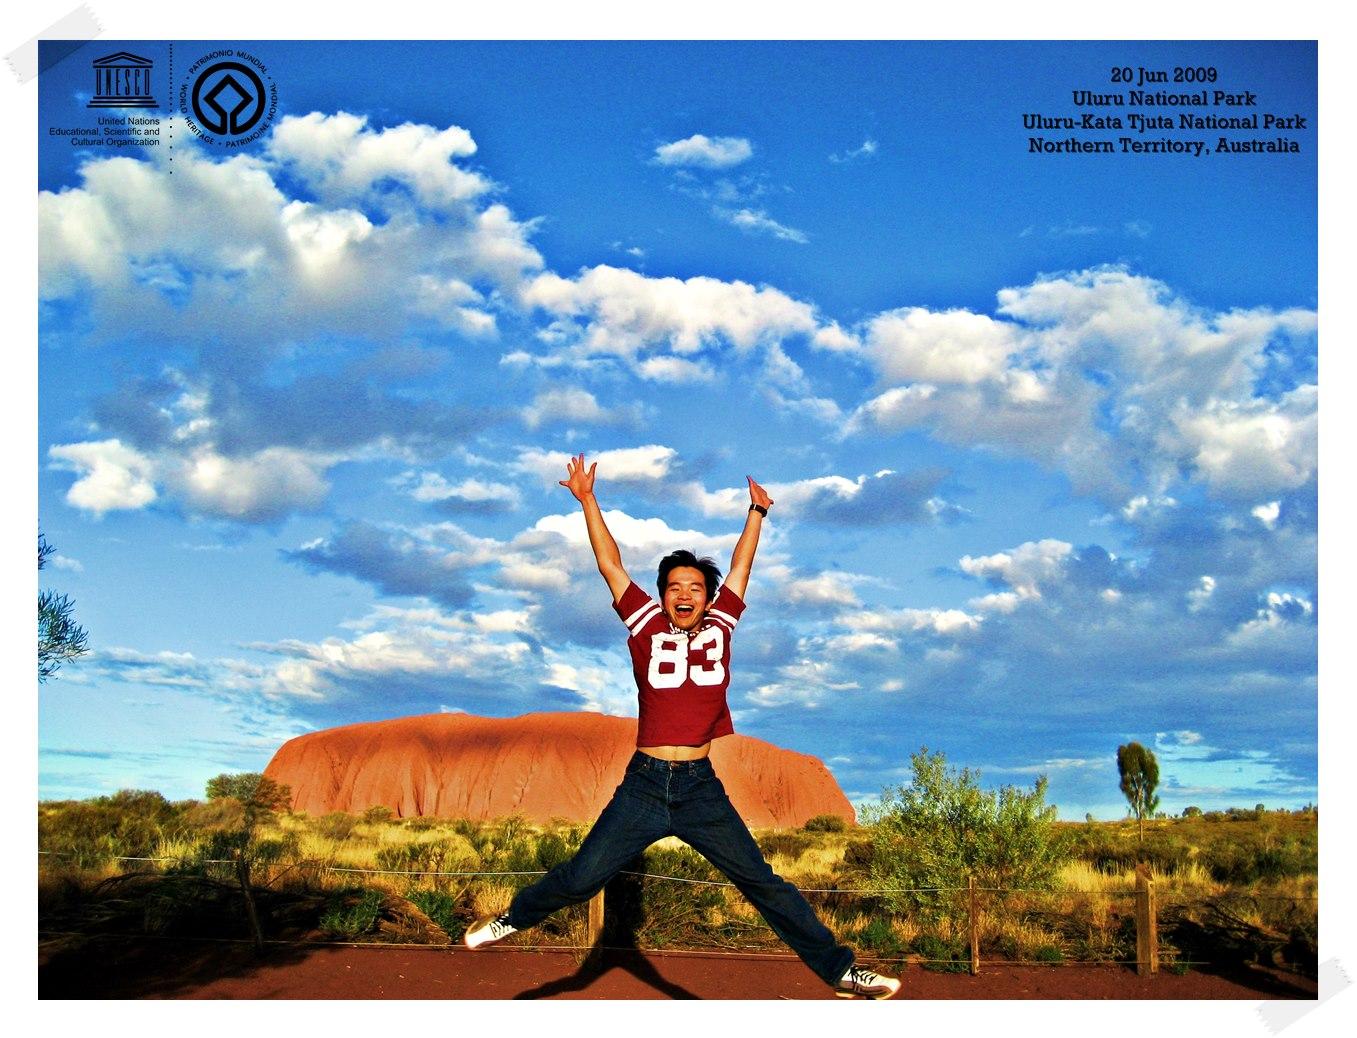 Uluru Giant Stones Uluru-Kata Tjuta National Park - Australia Thomas shaw